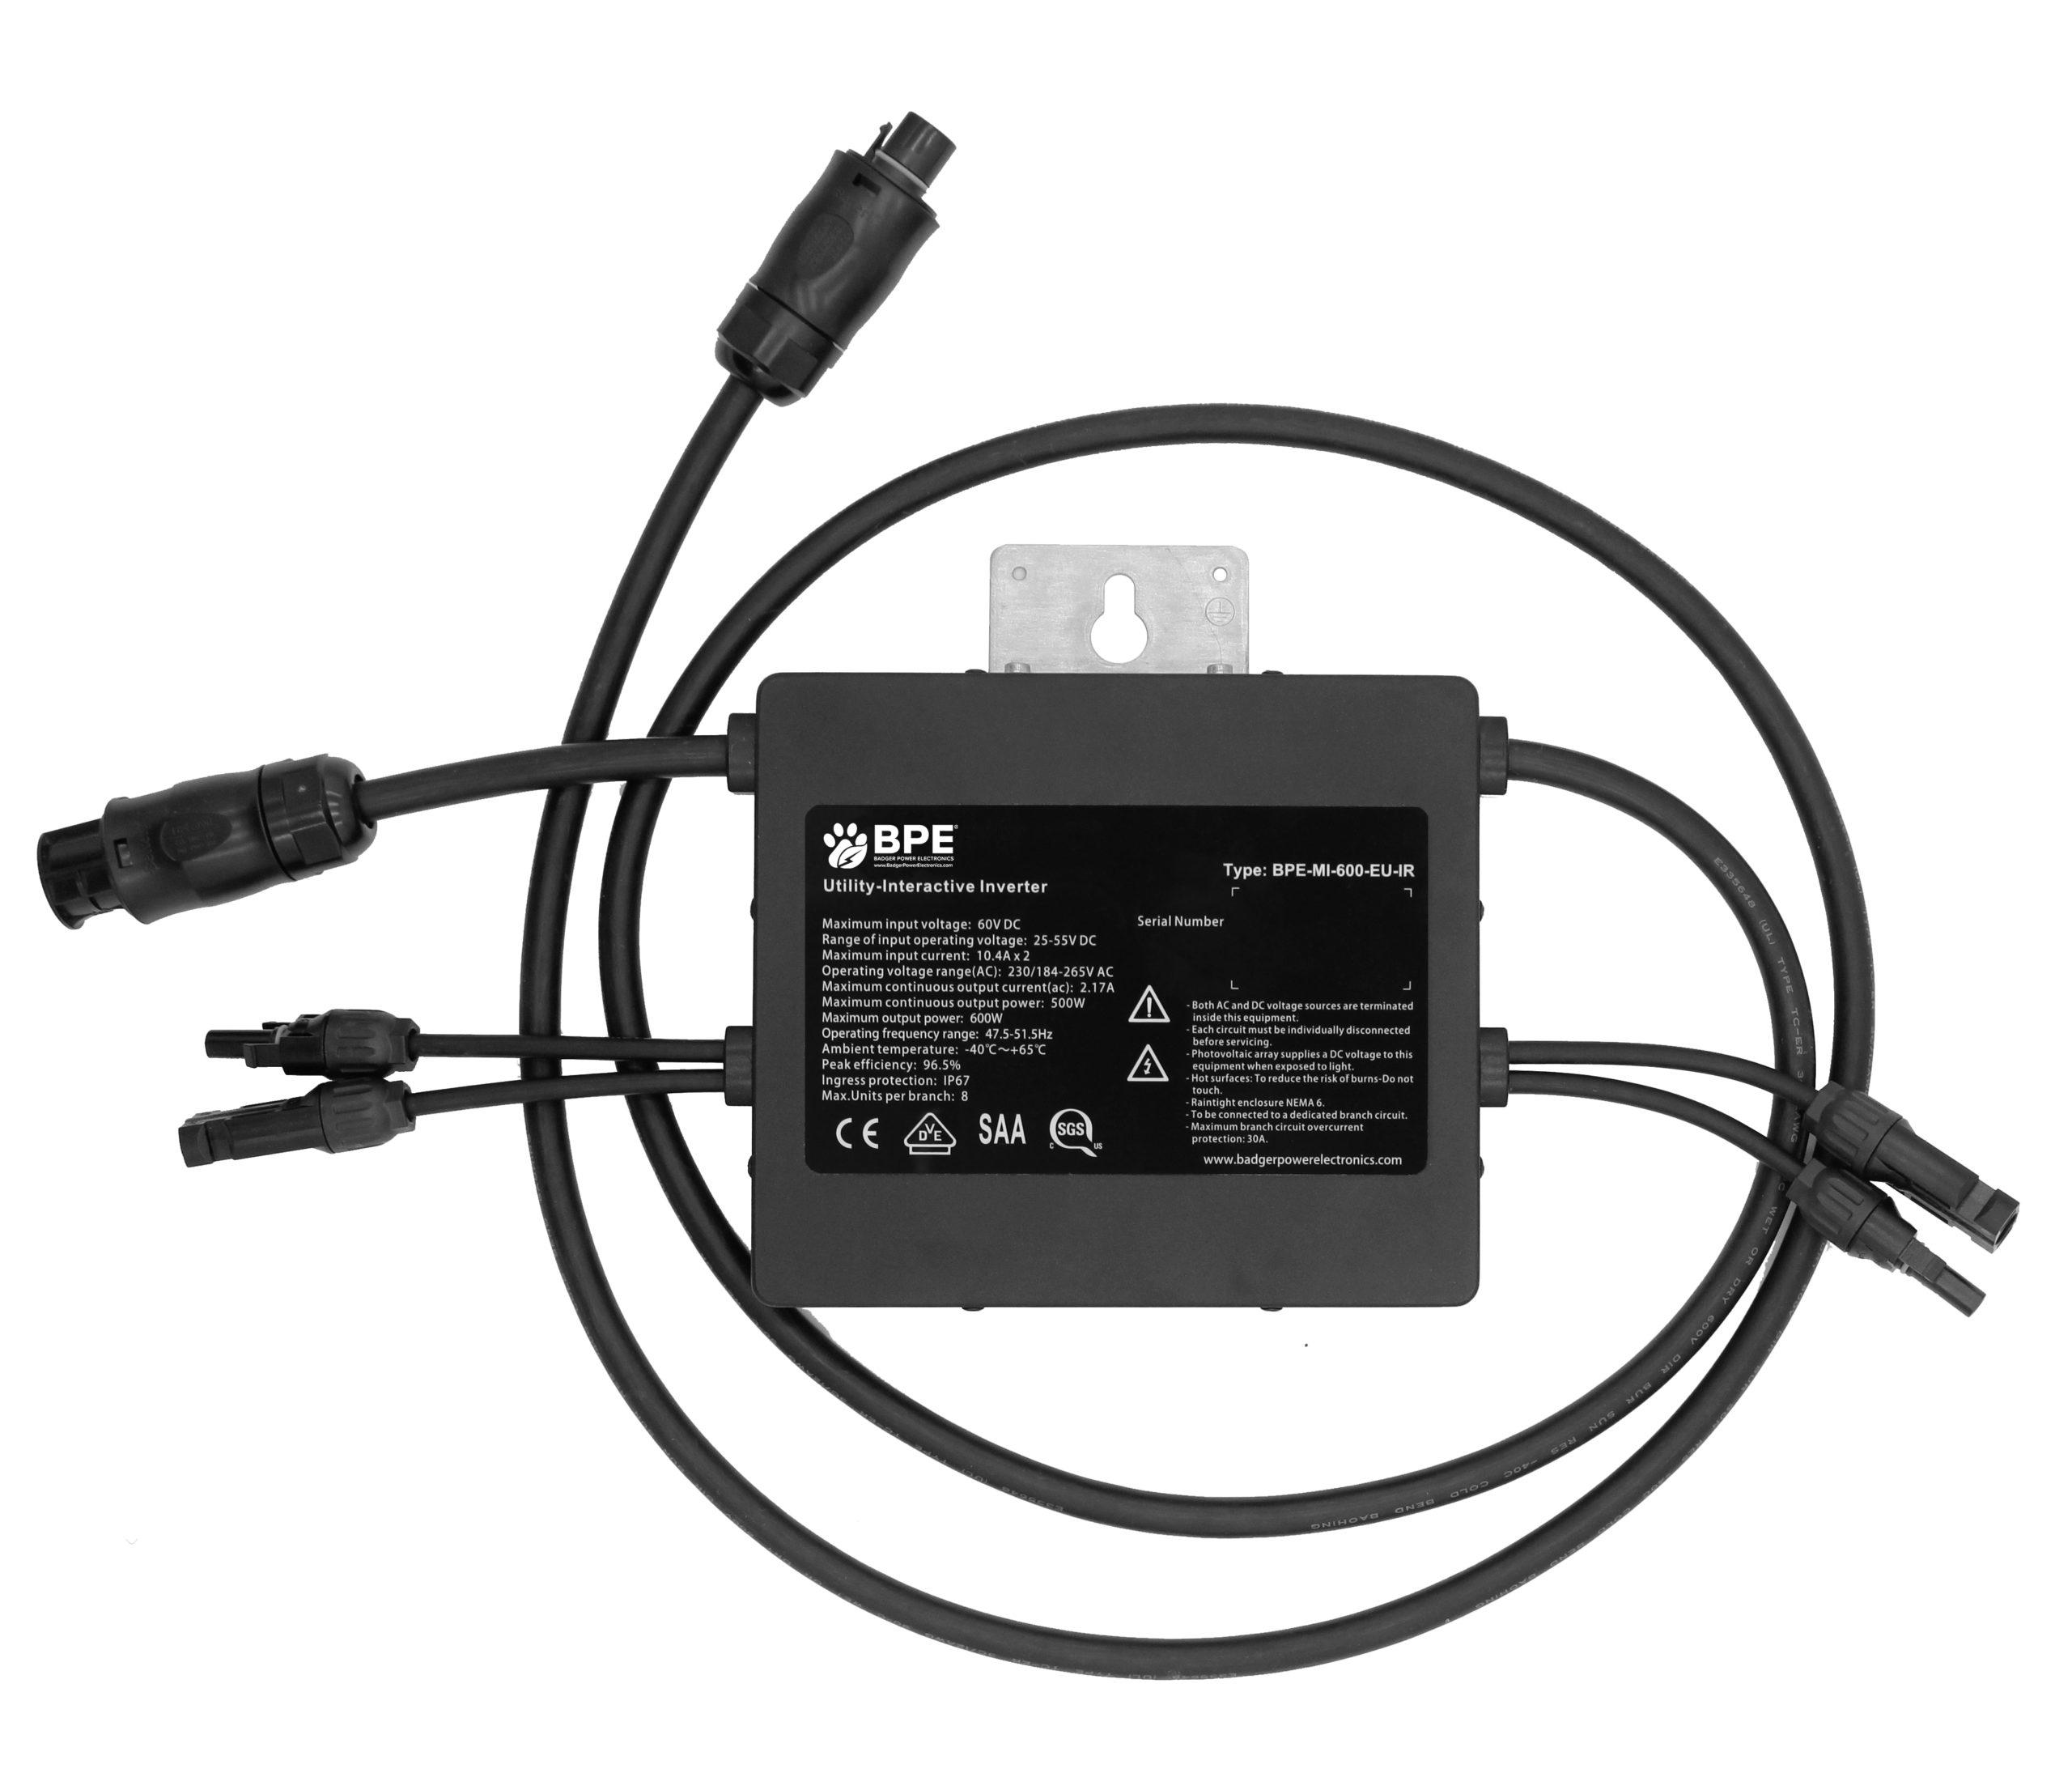 BPE Dual Port Microinverter